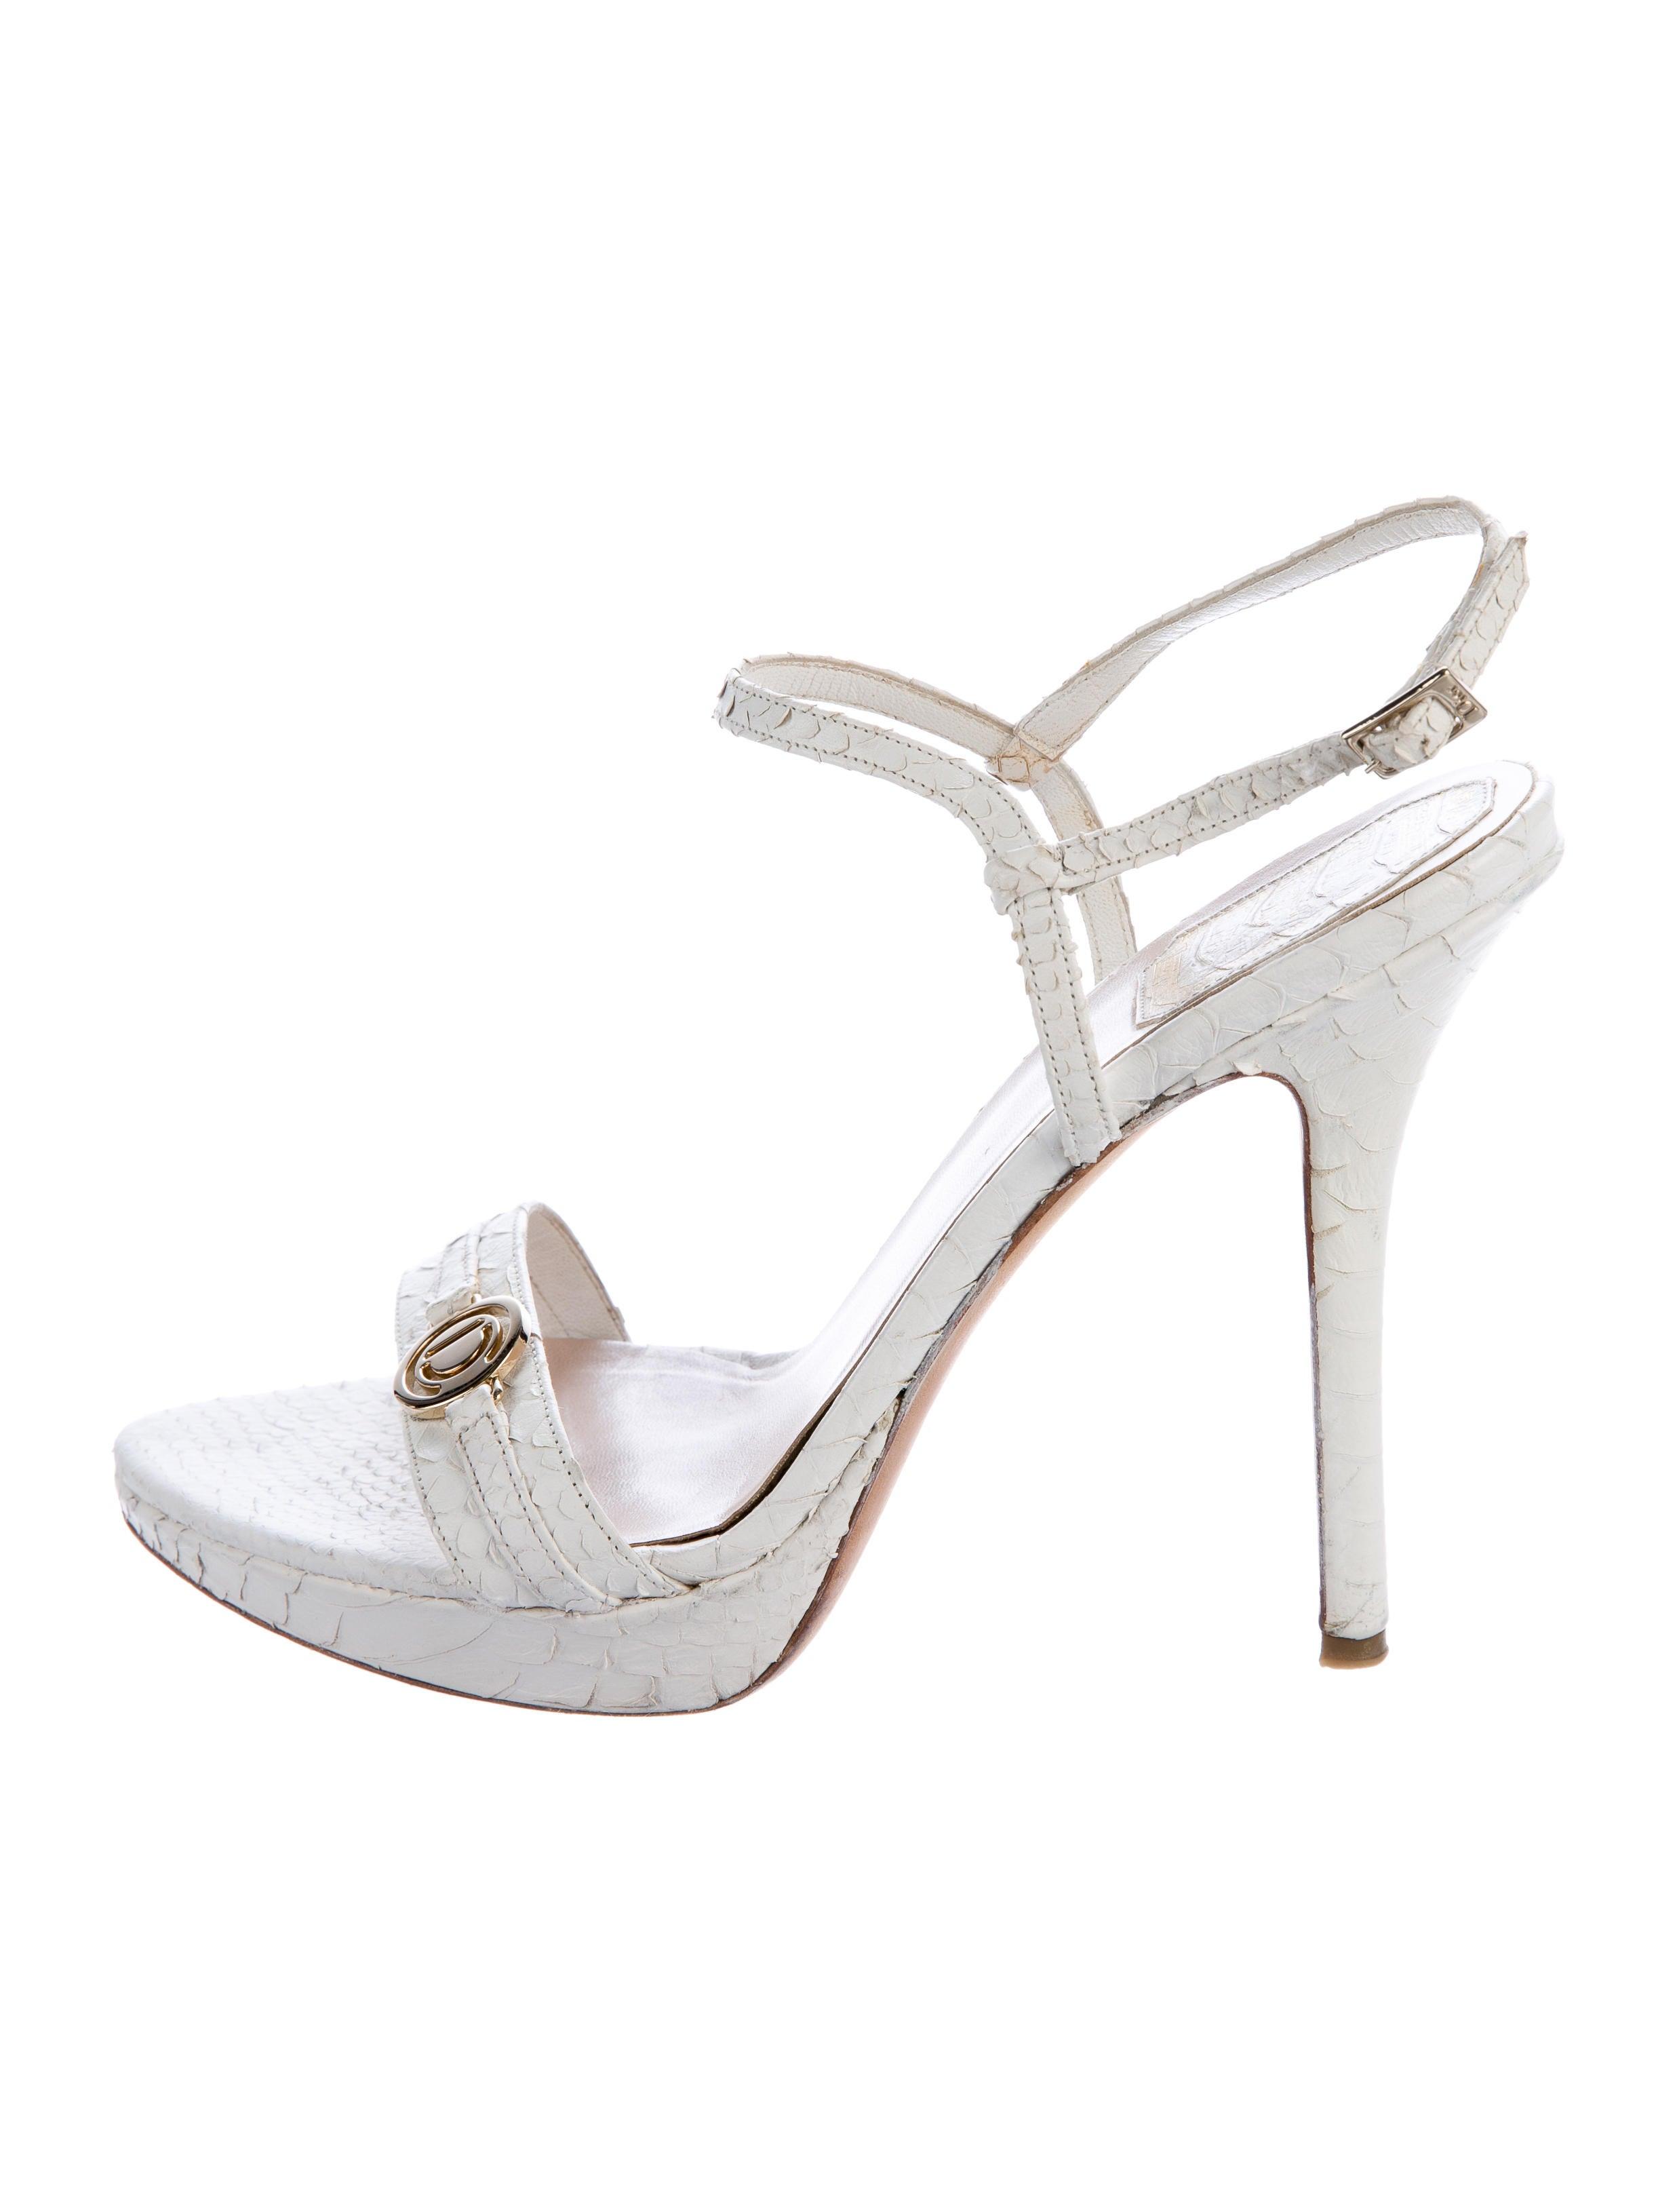 2014 newest online Christian Dior Snakeskin Platform Sandals cheap best store to get VAr1r